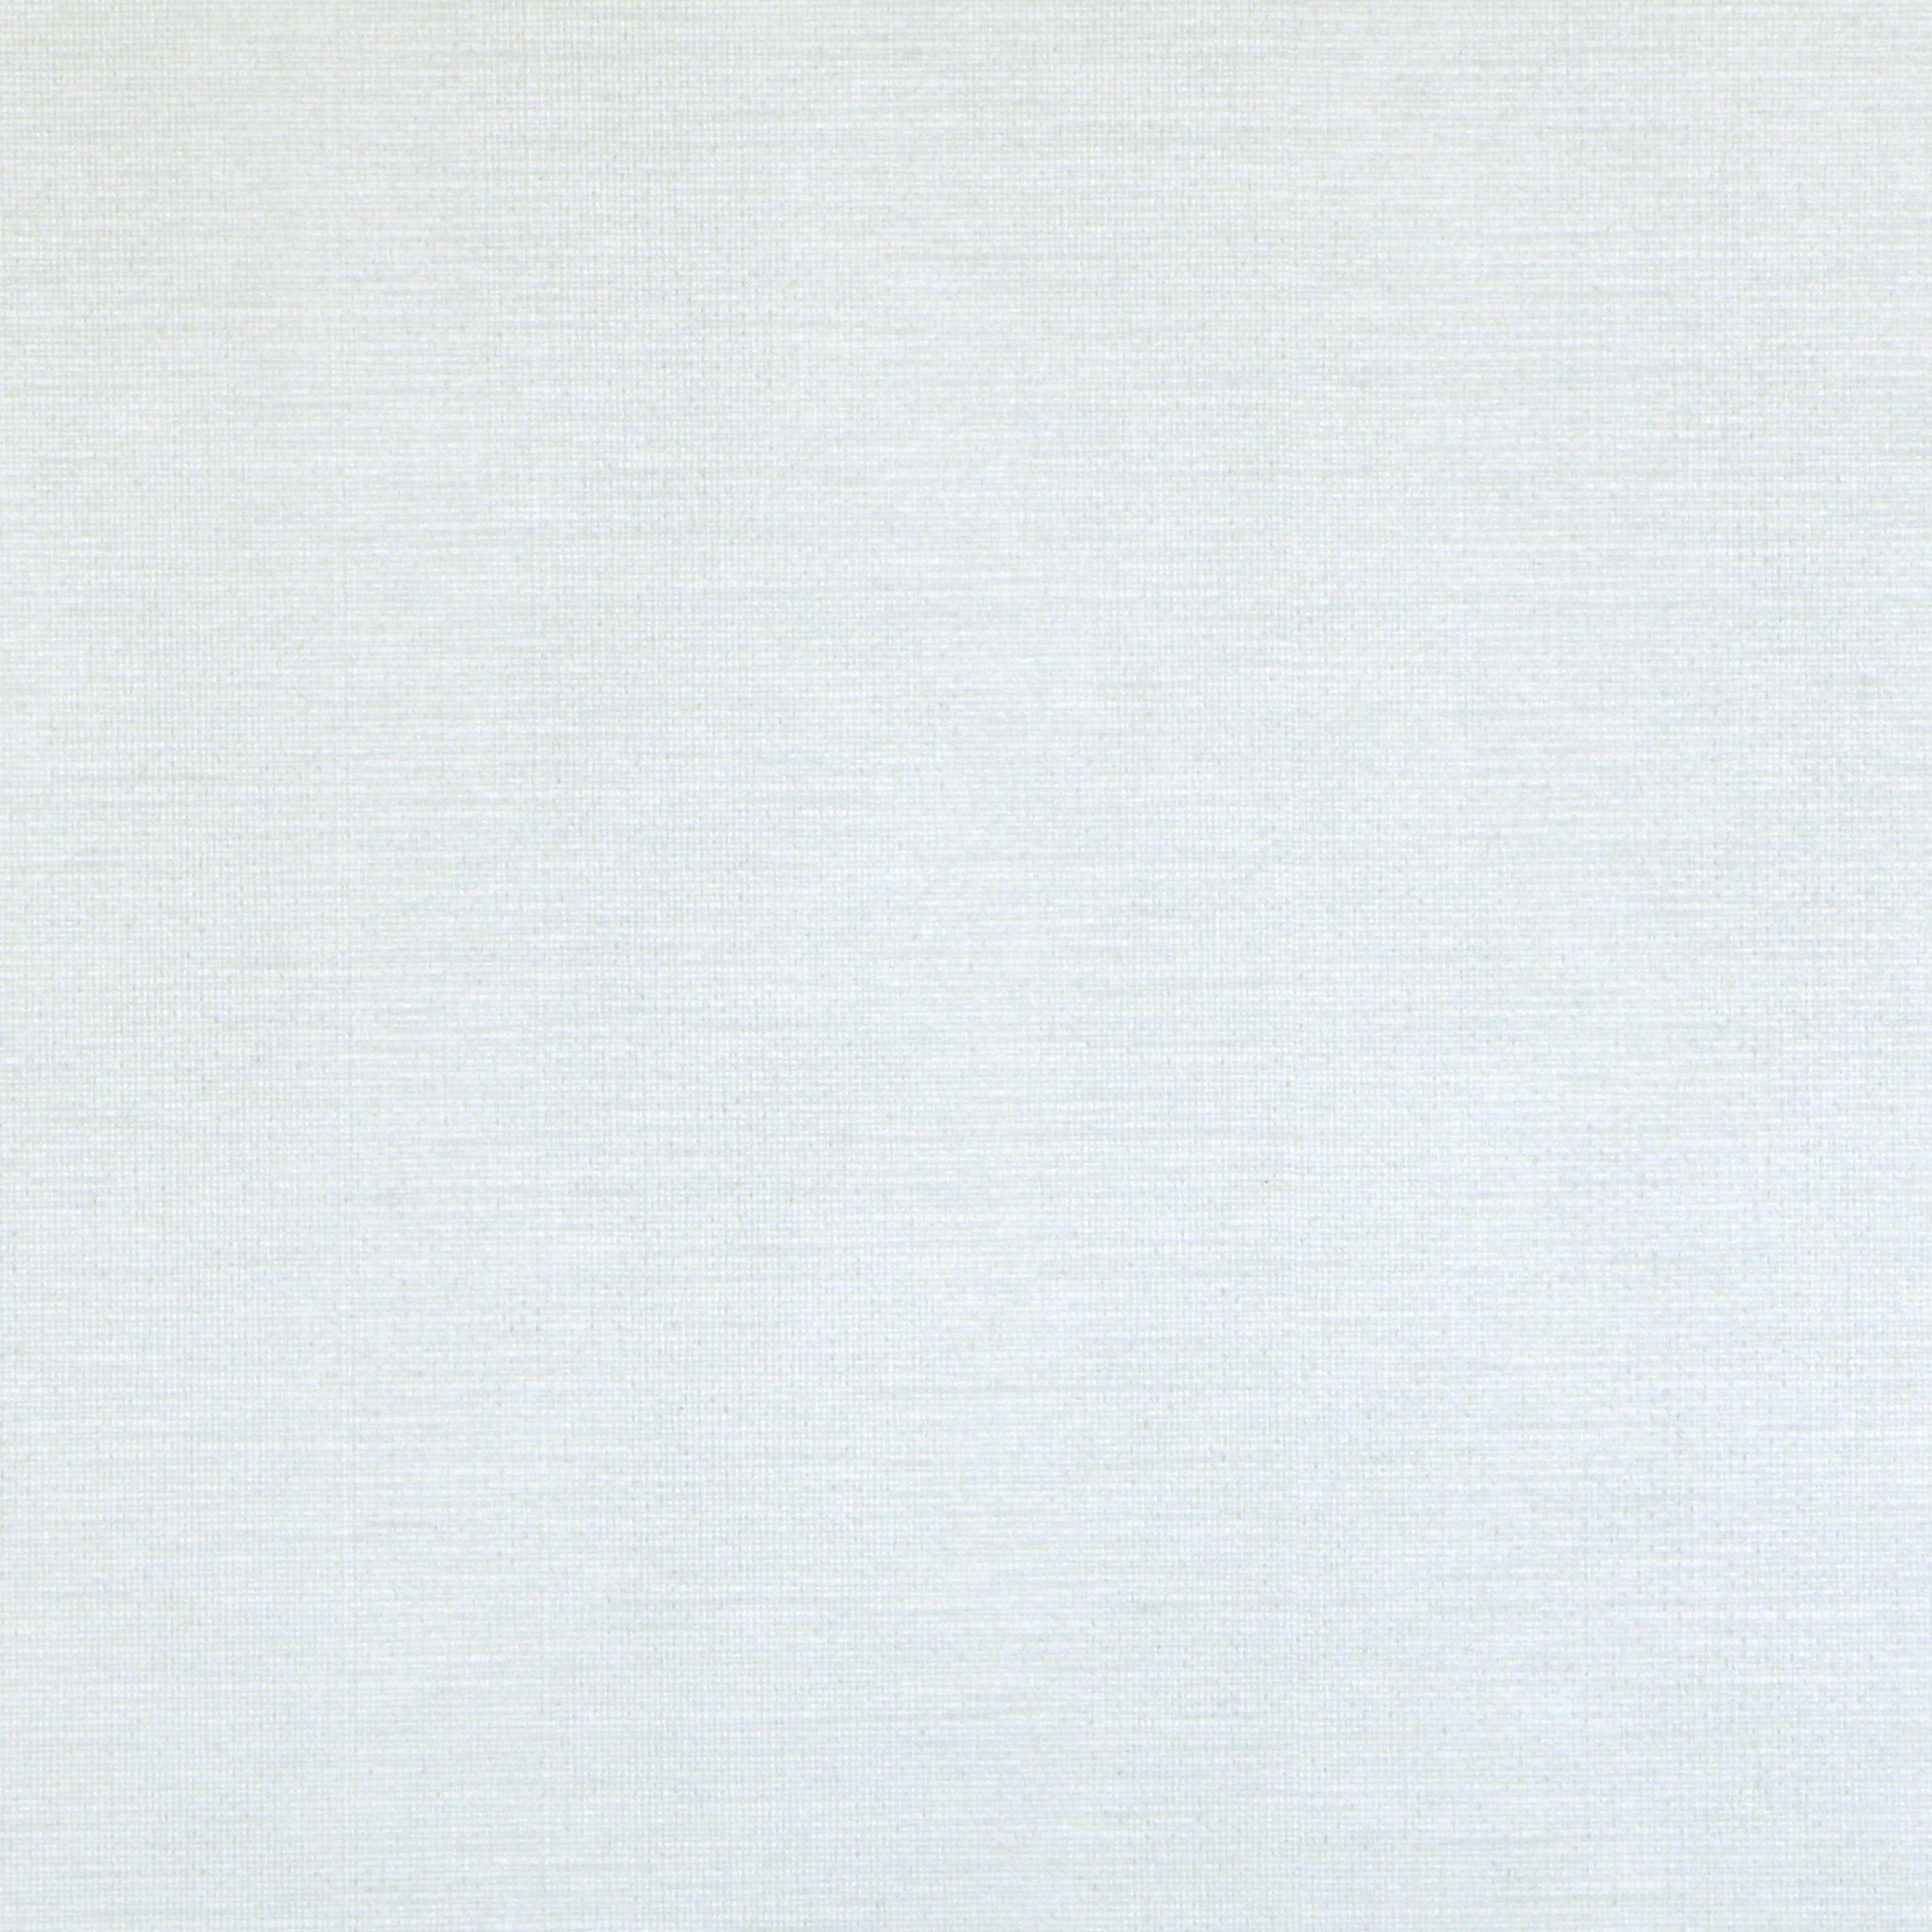 Hoffmaster 257005 Bello Lino Premium Disposable Dinner Napkin, 15-1/2'' Length, 15-1/2'' Width, Ice (Pack of 600)